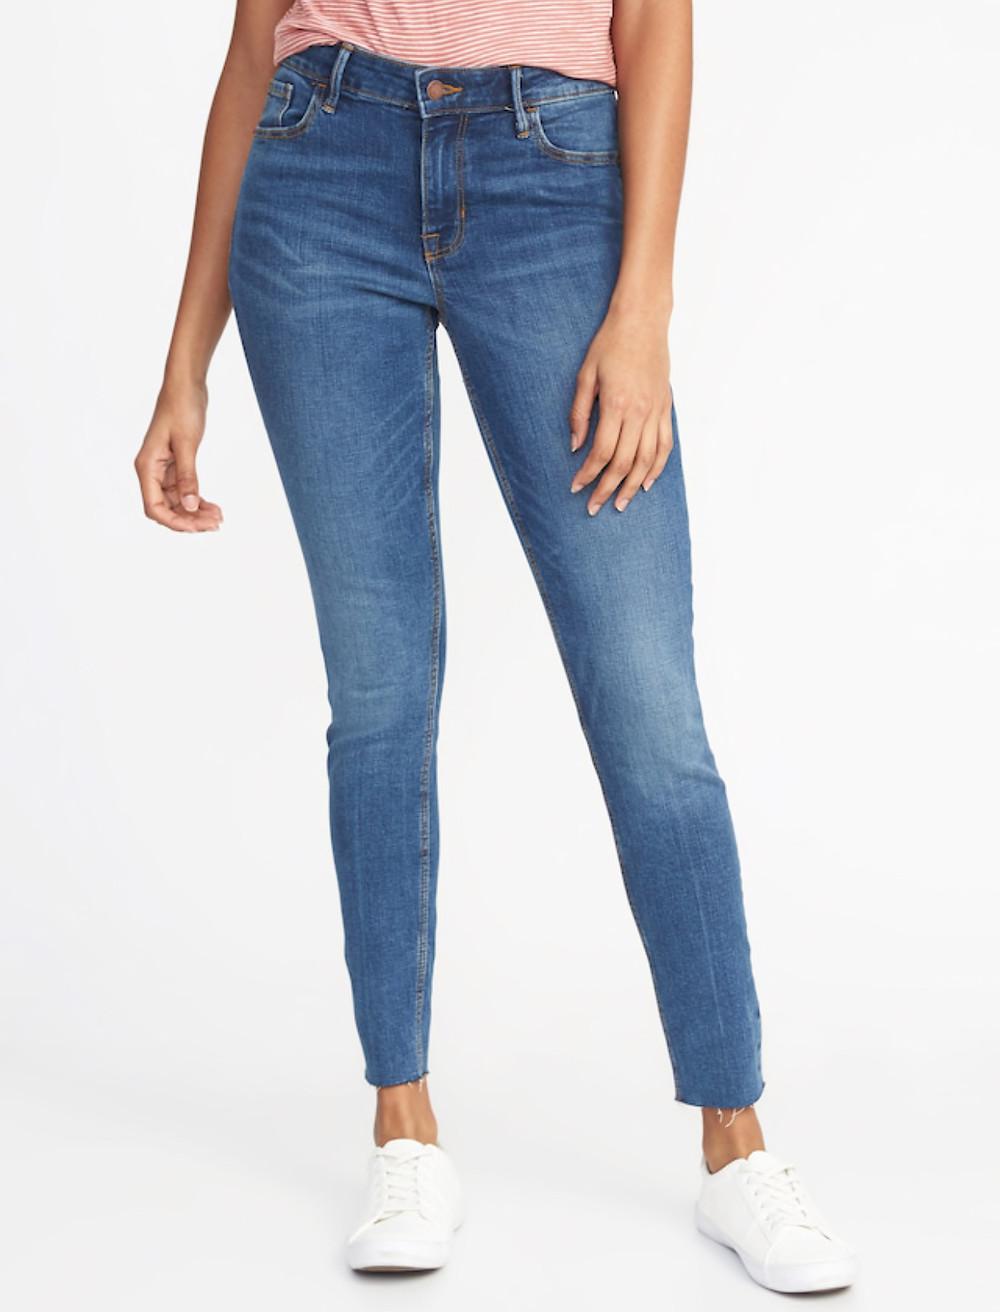 Mid-Rise Raw Edge Ankle Length Rockstar Jeans